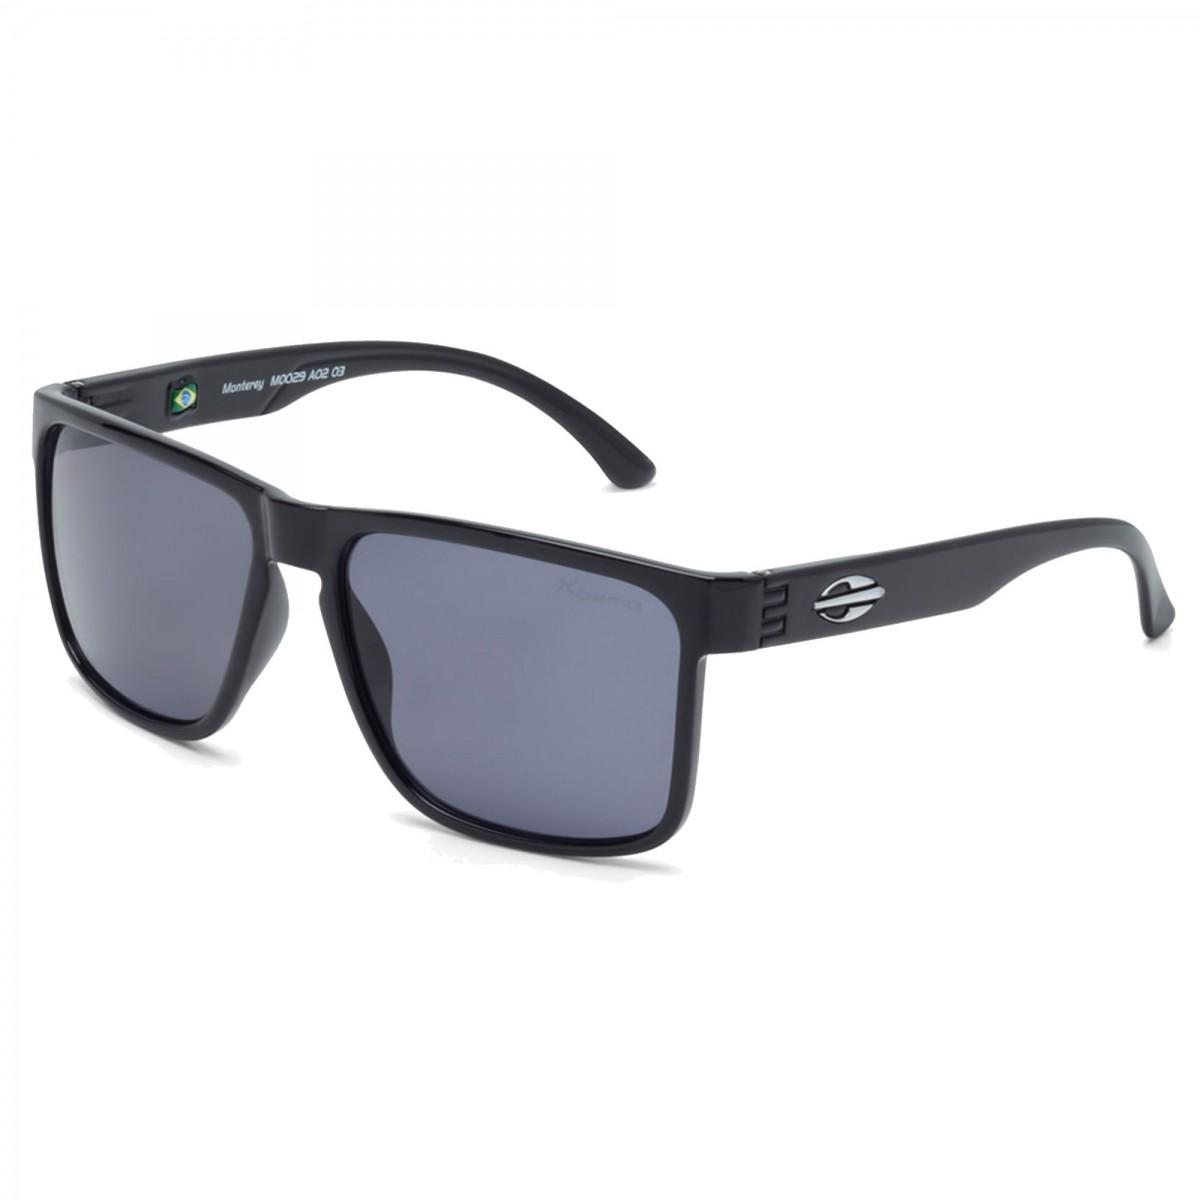 Imagem - Óculos de Sol Mormaii Monterey Polarizado - 2.12791